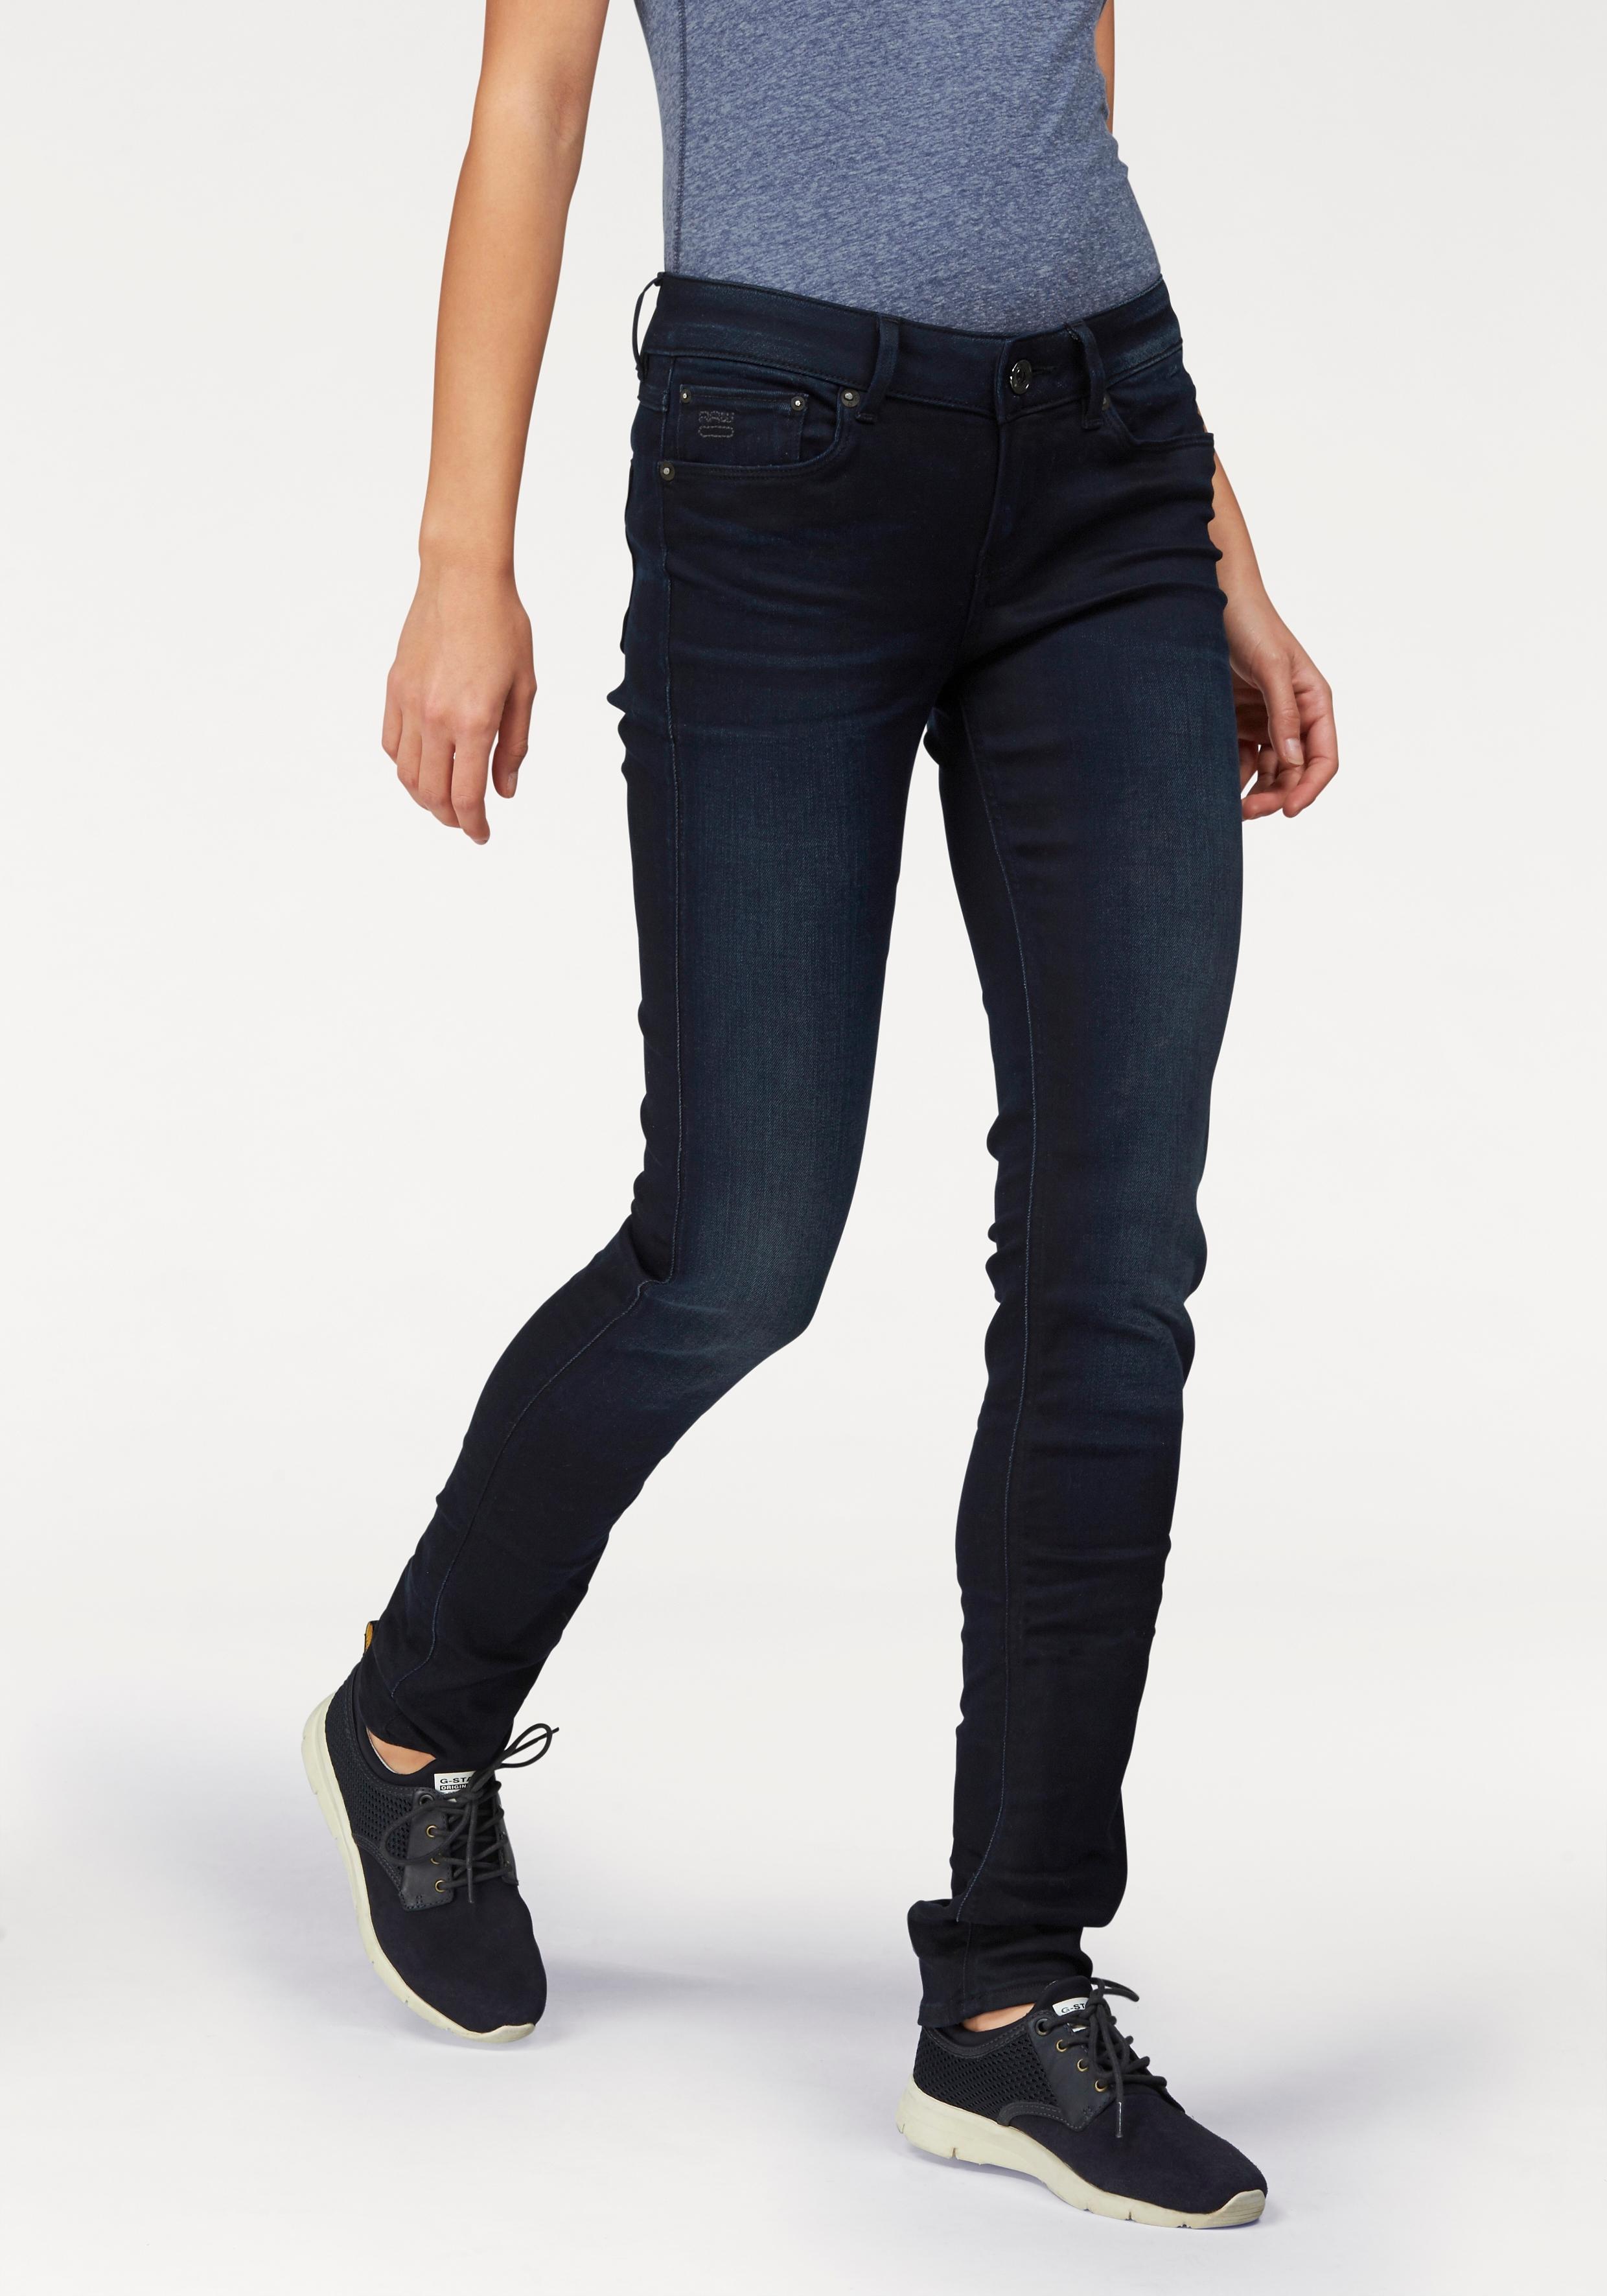 G-star Raw G-STAR stretchjeans »3301 contour high skinny« nu online kopen bij OTTO